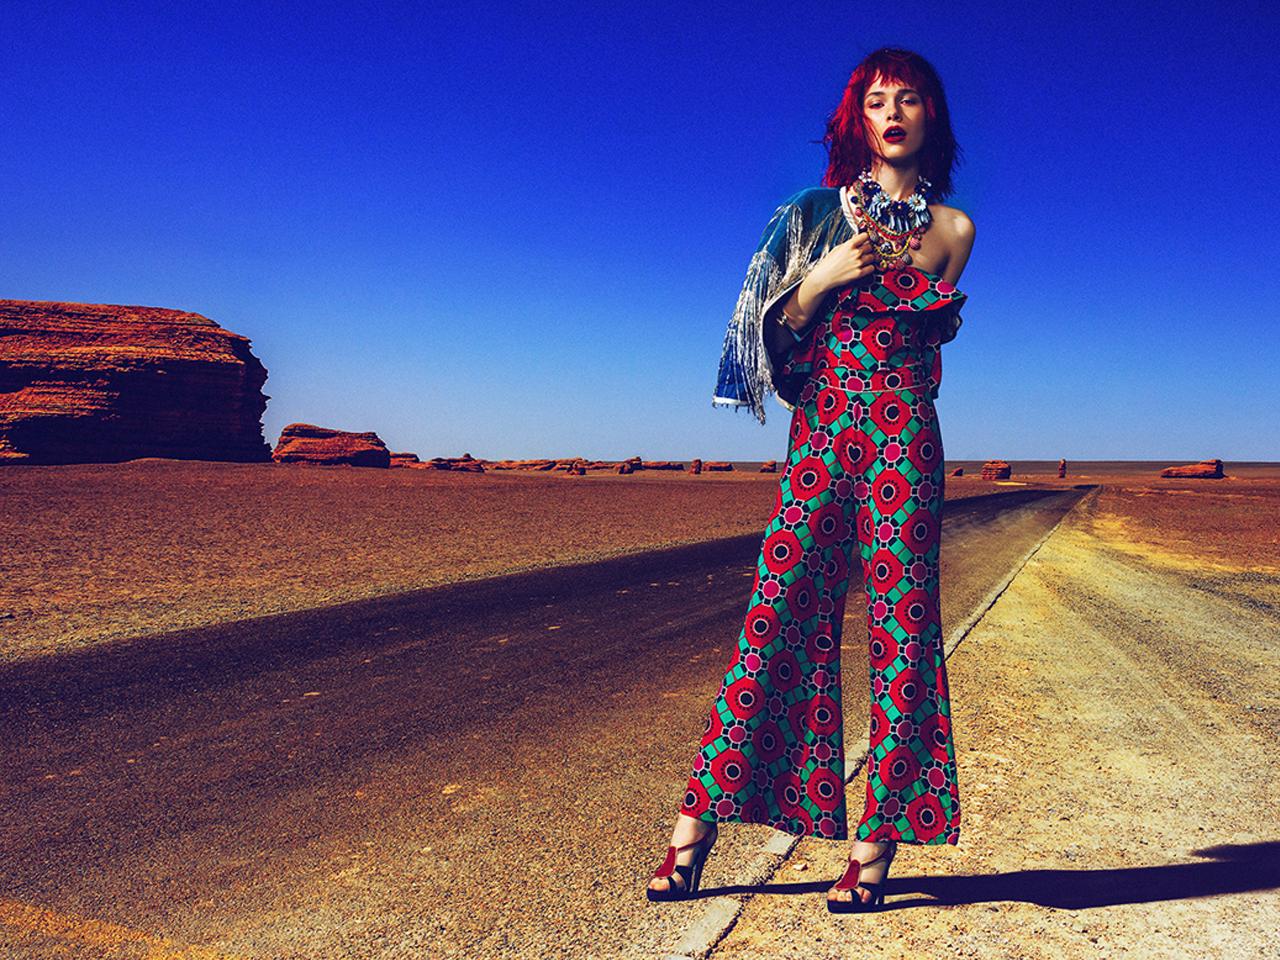 Автостопом на пустыне / фото Momo Chen